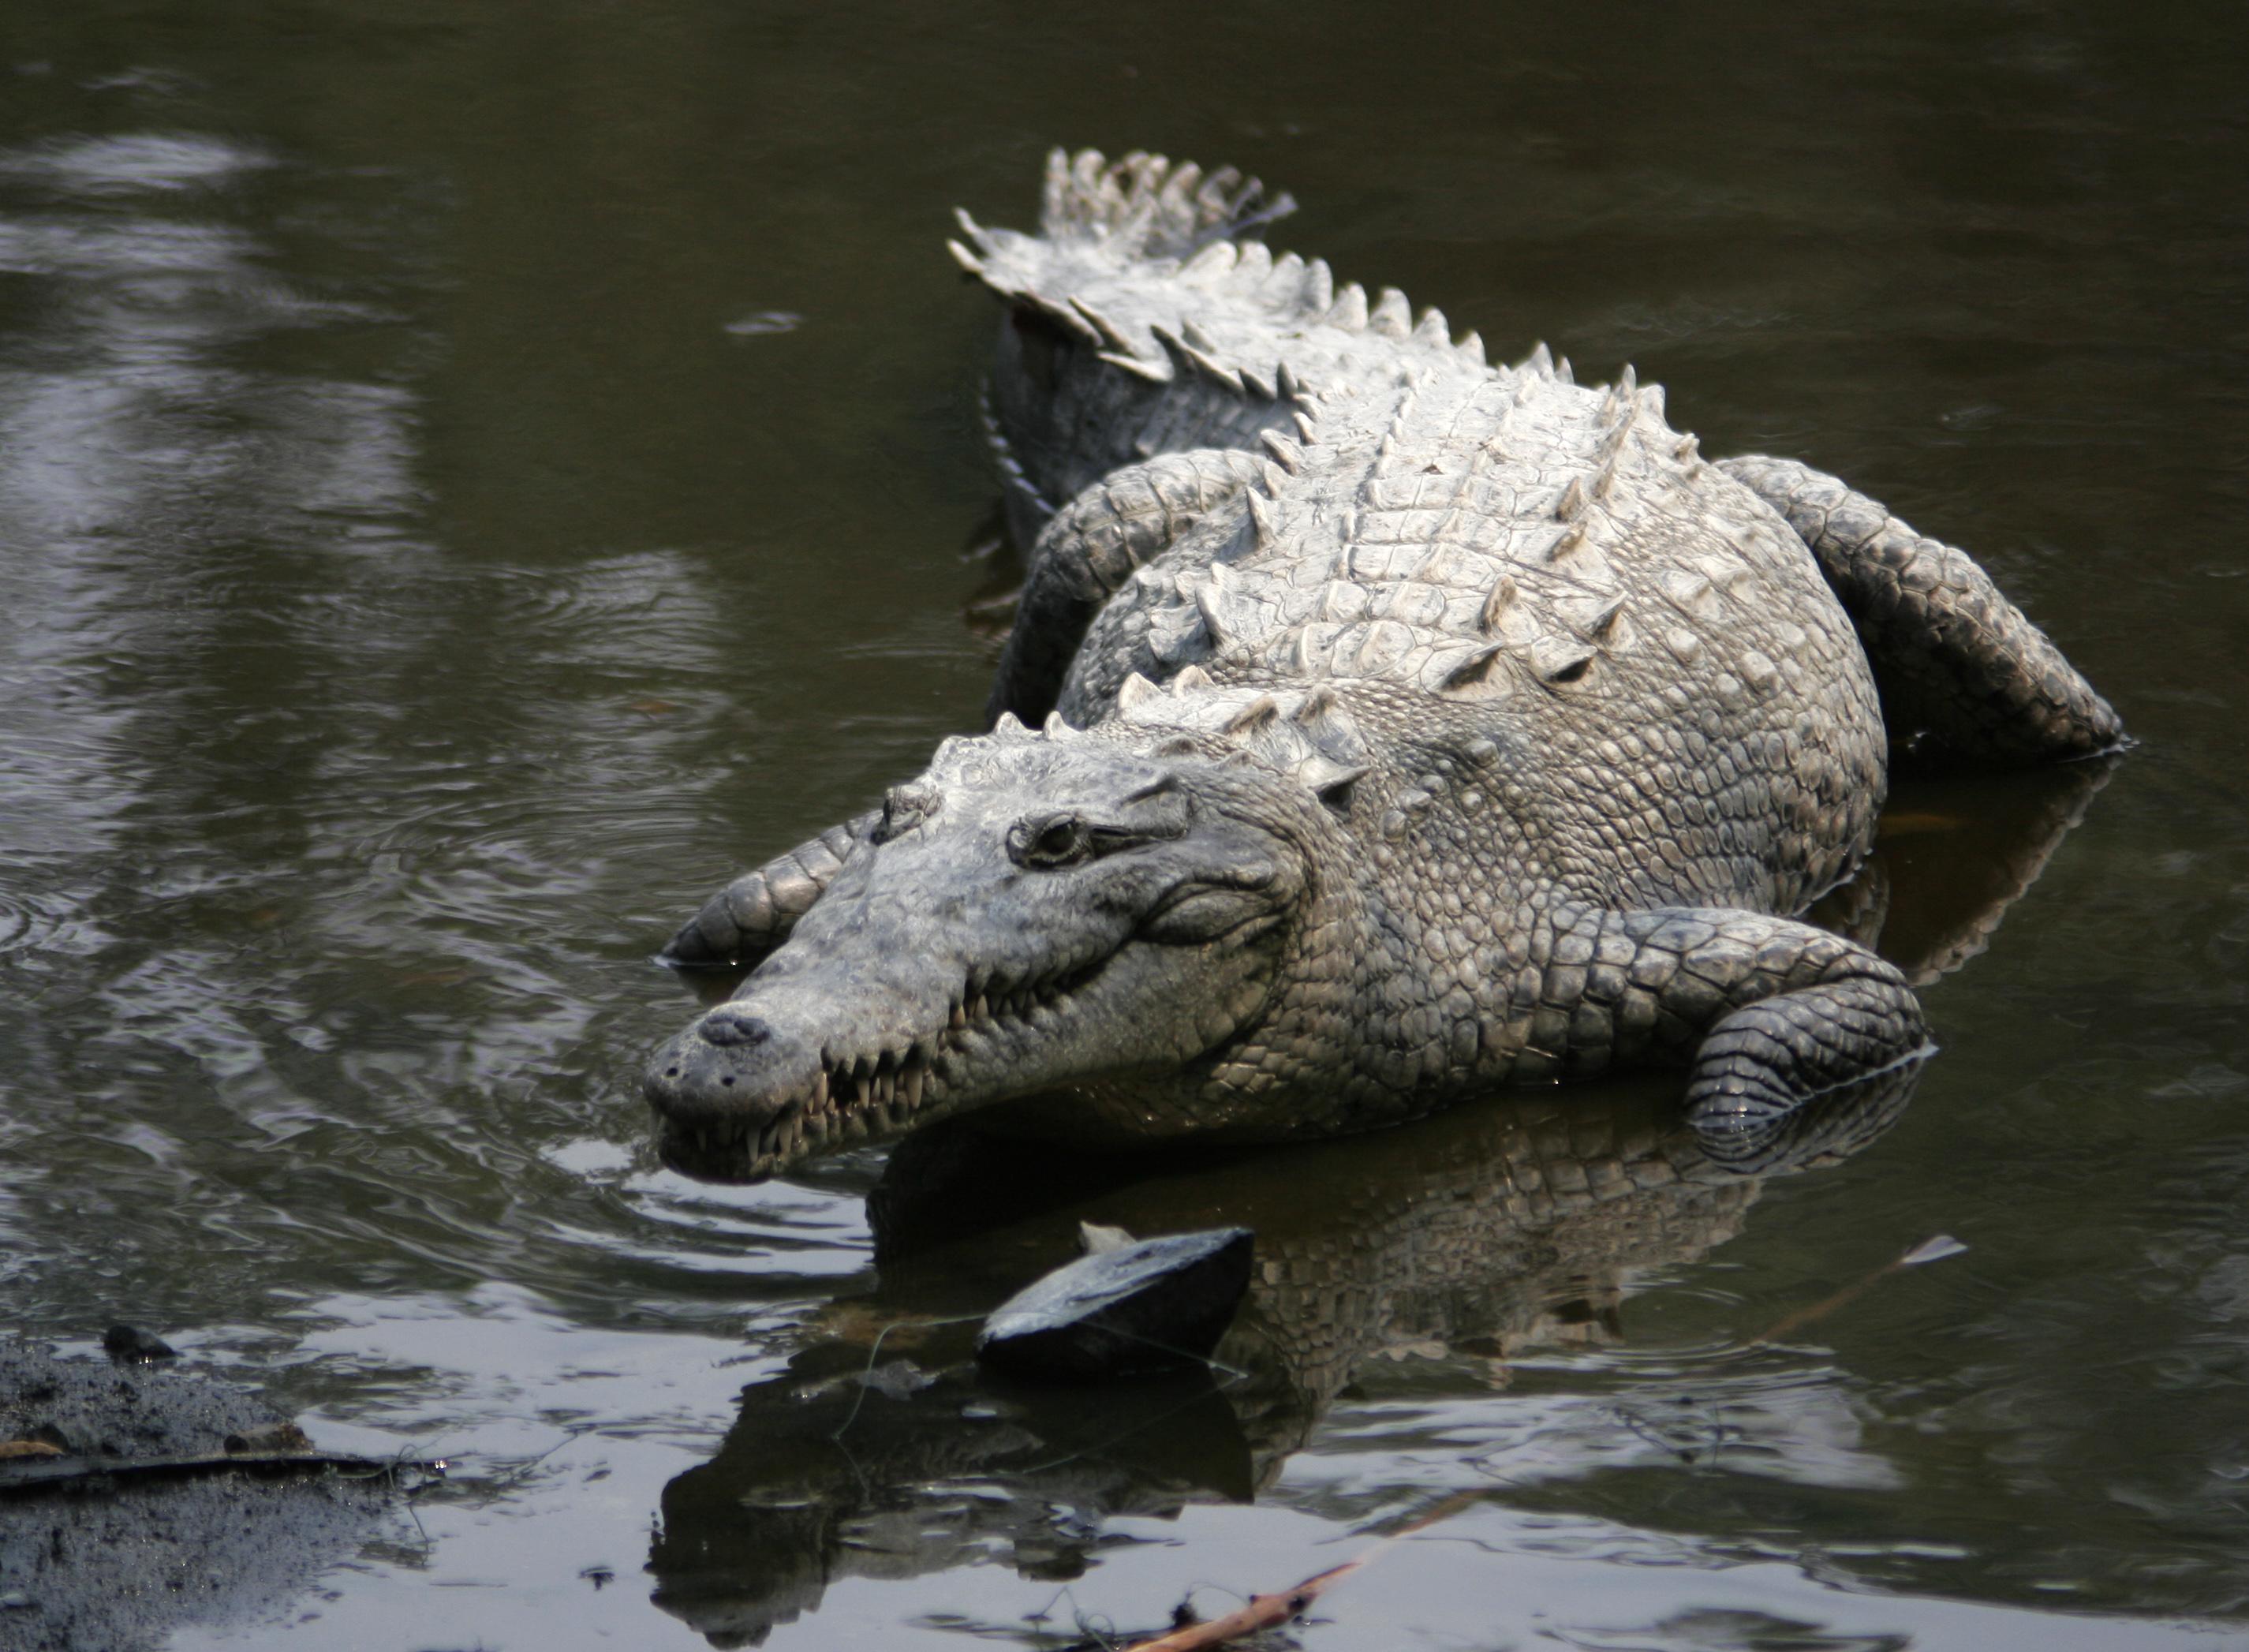 Crocodylus_acutus_mexico_02